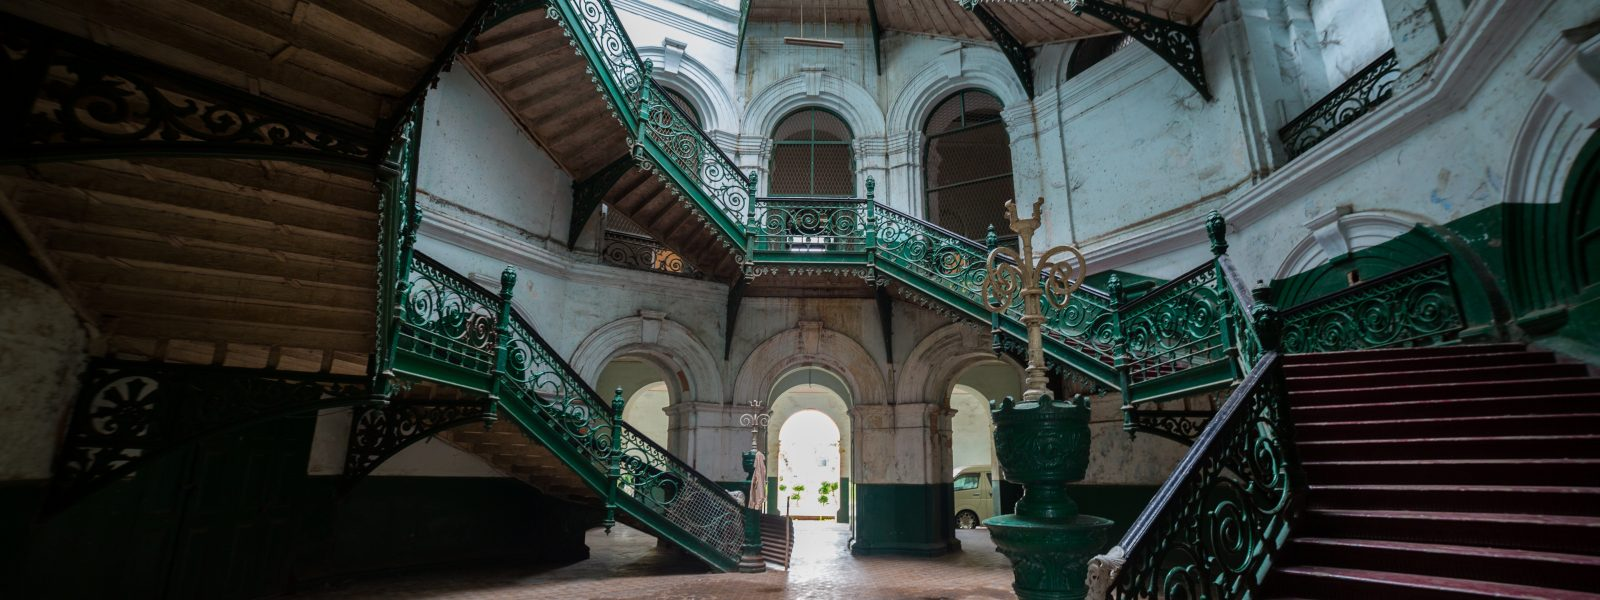 The Secretariat - South Wing Staircase - Yangon - Sampan Travel